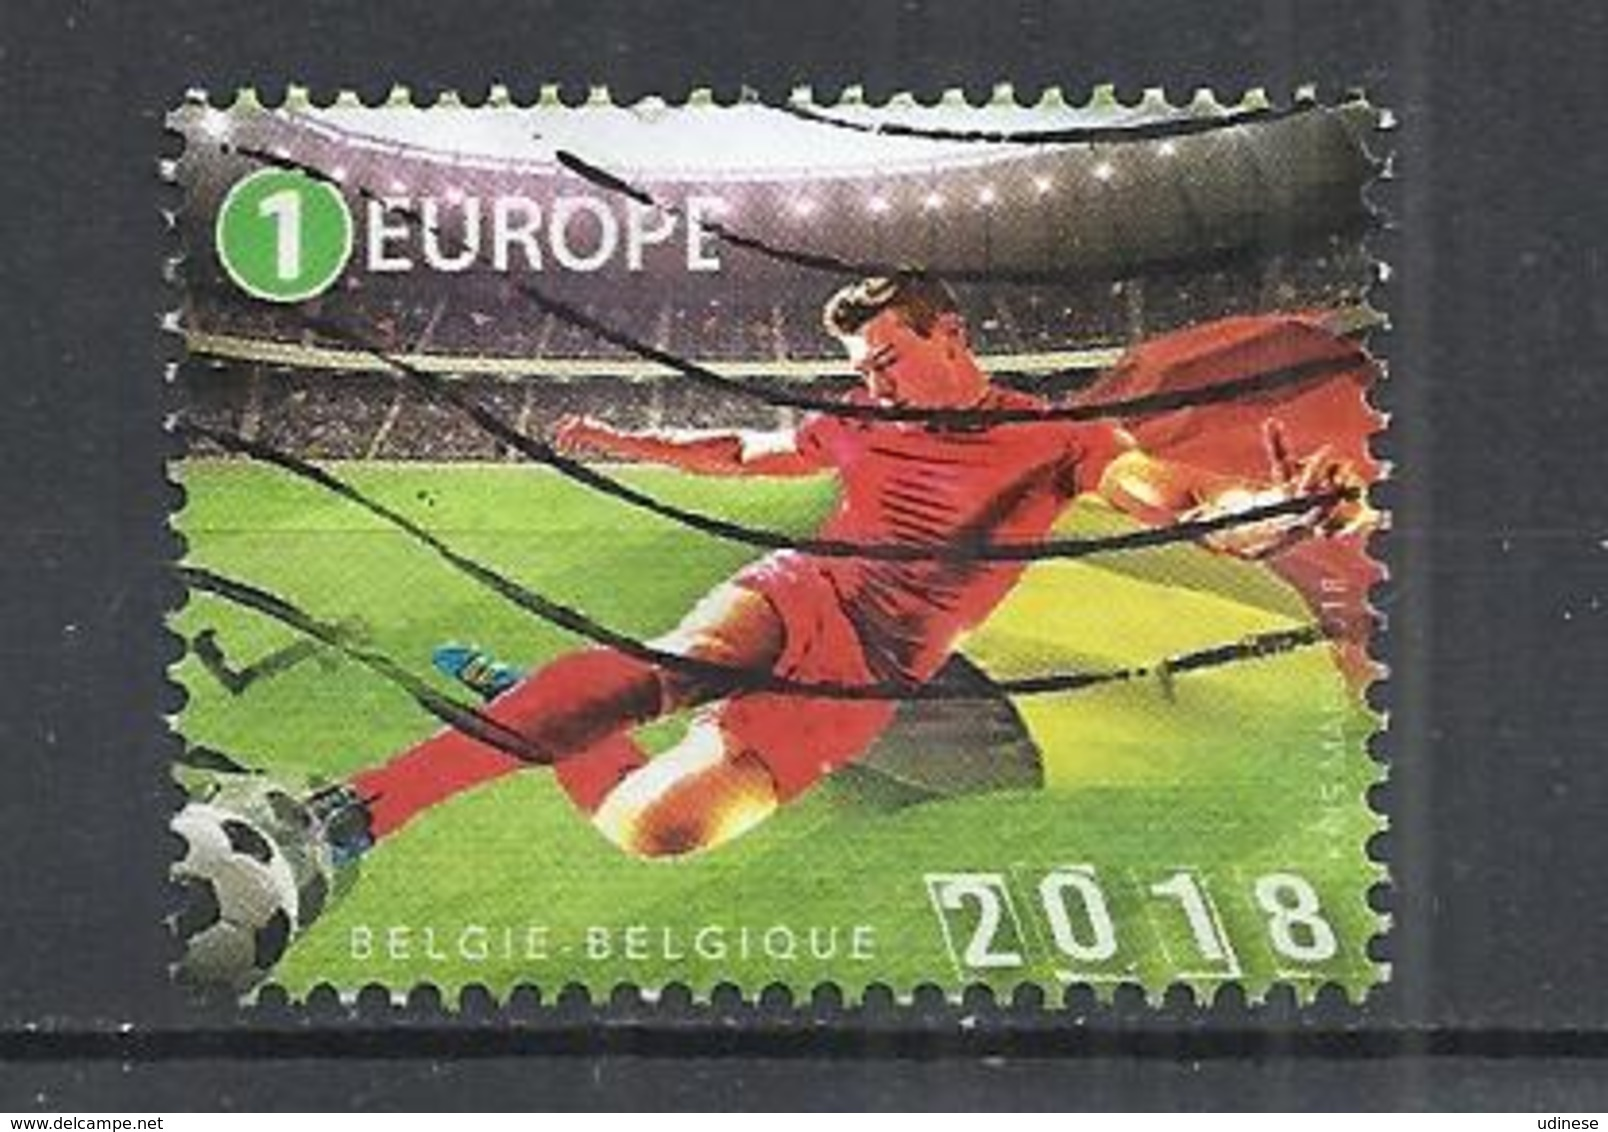 BELGIUM 2018 - WORLD CUP FOOTBALL - USED OBLITERE GESTEMPELT USADO - 2018 – Russie